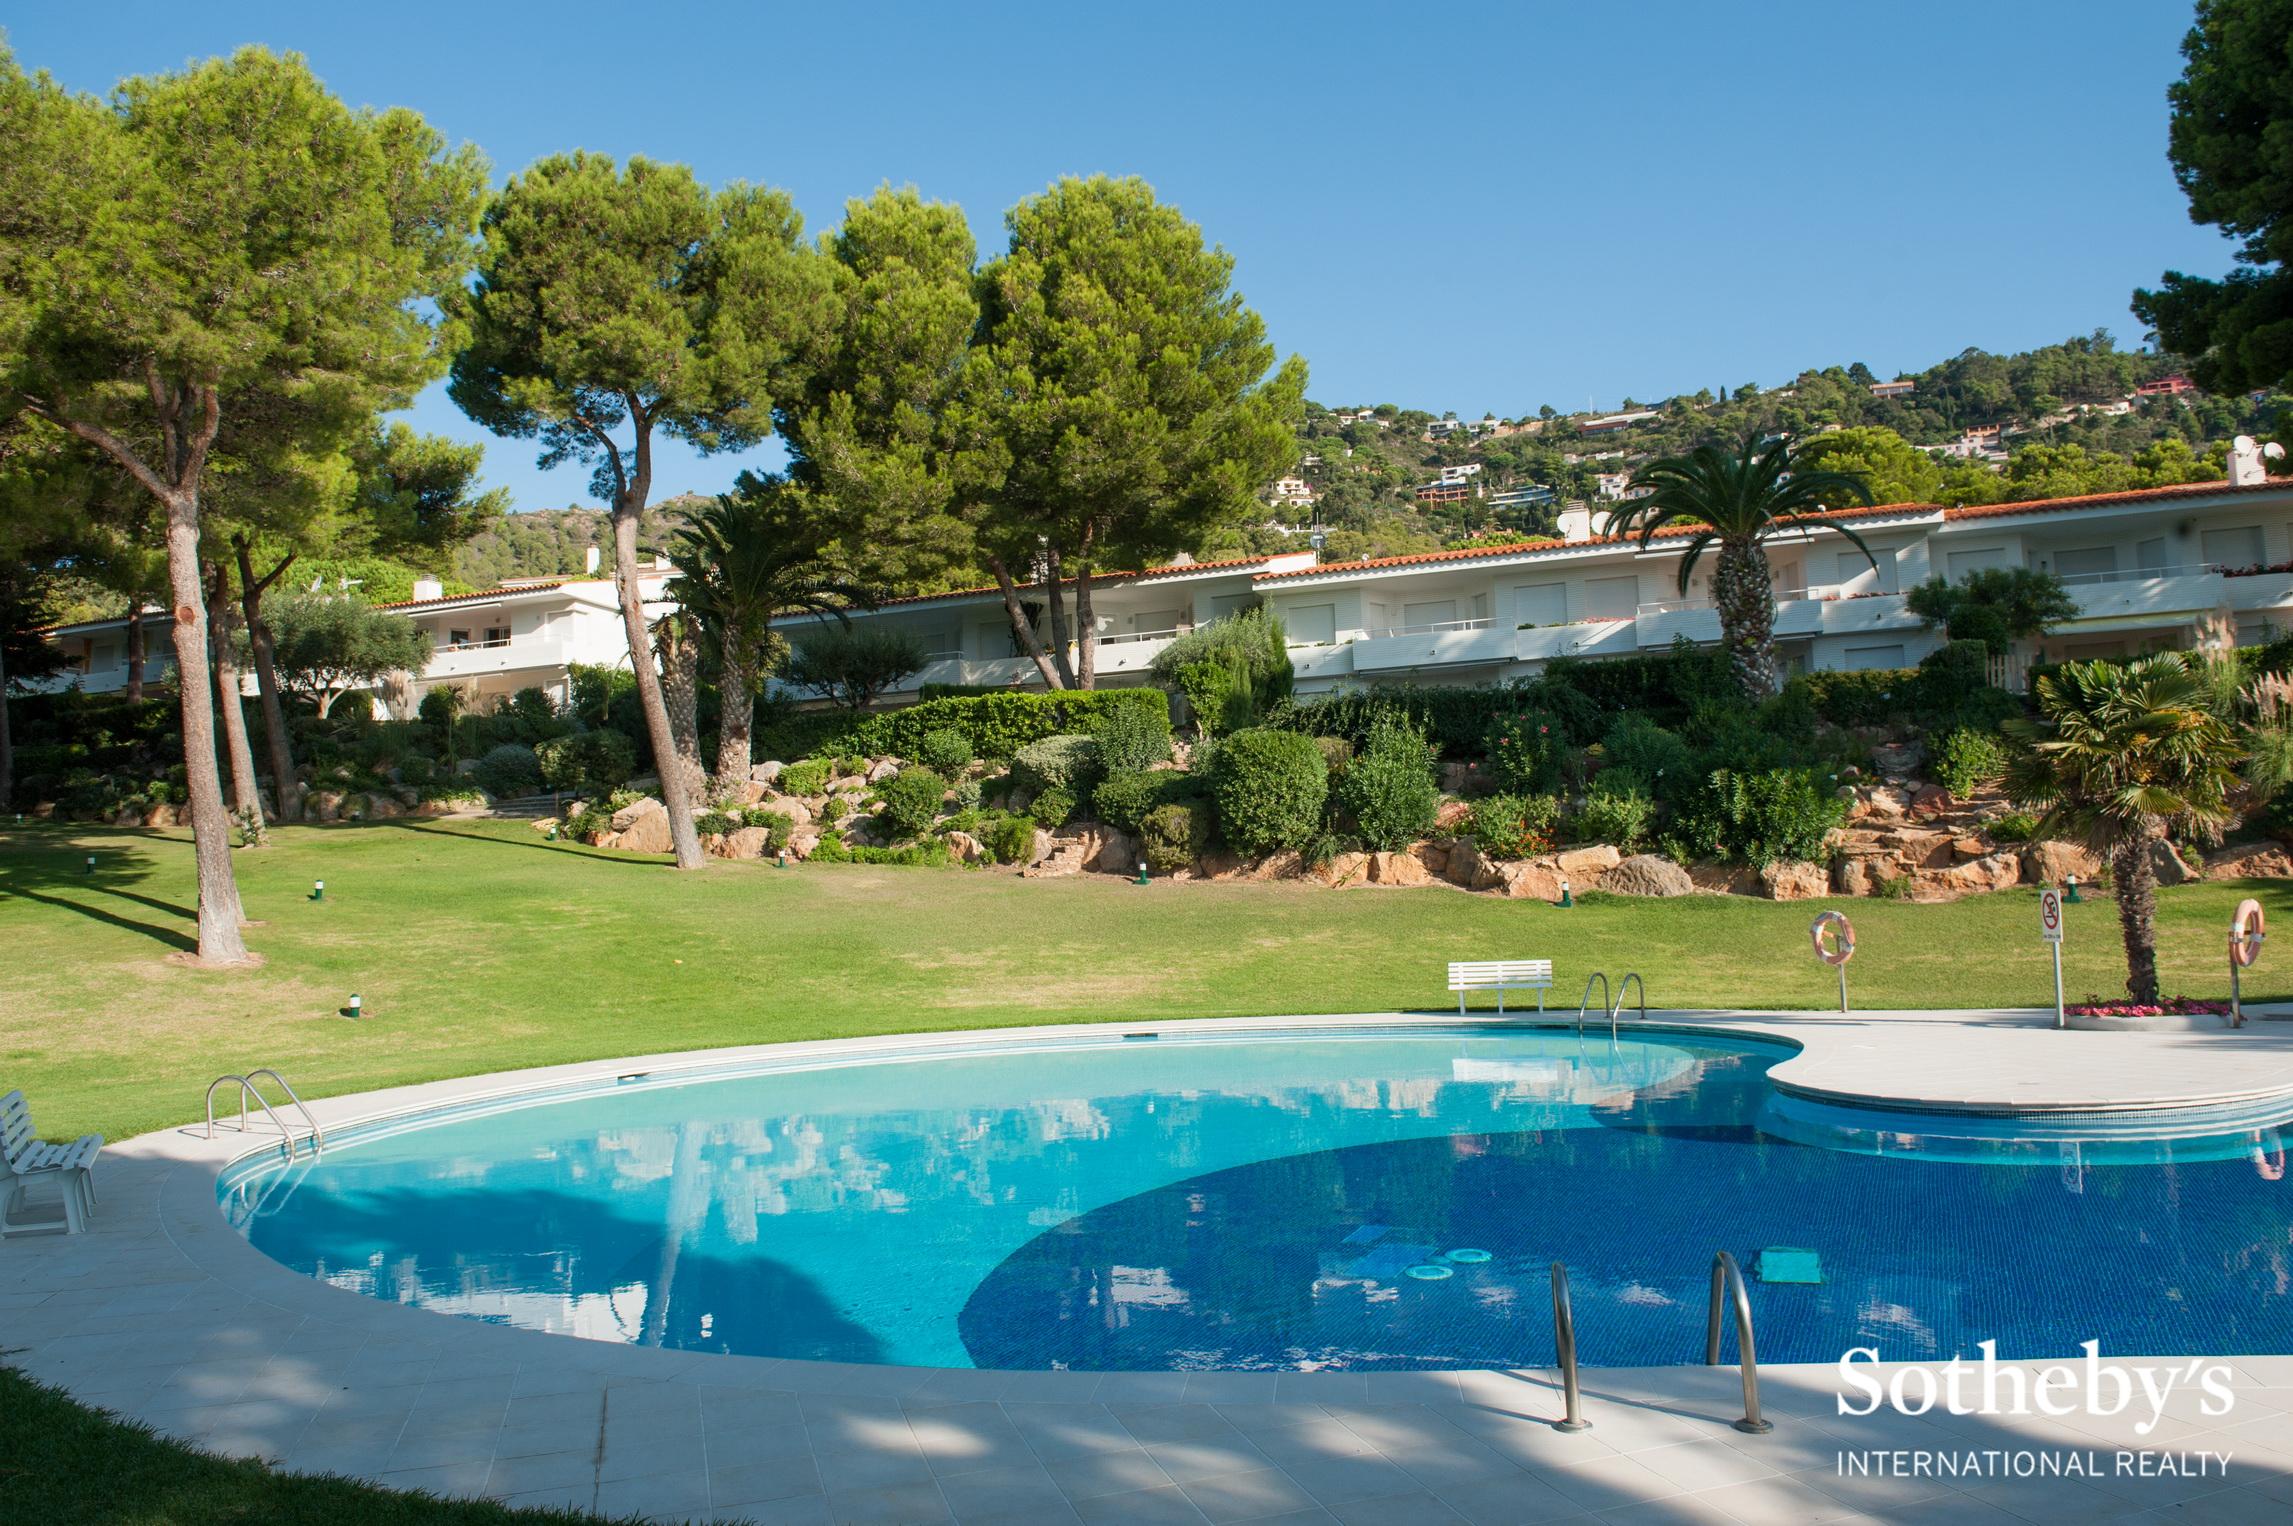 Apartment for Sale at Apartment for sale near the beach in Aiguablava Begur, Costa Brava 17255 Spain